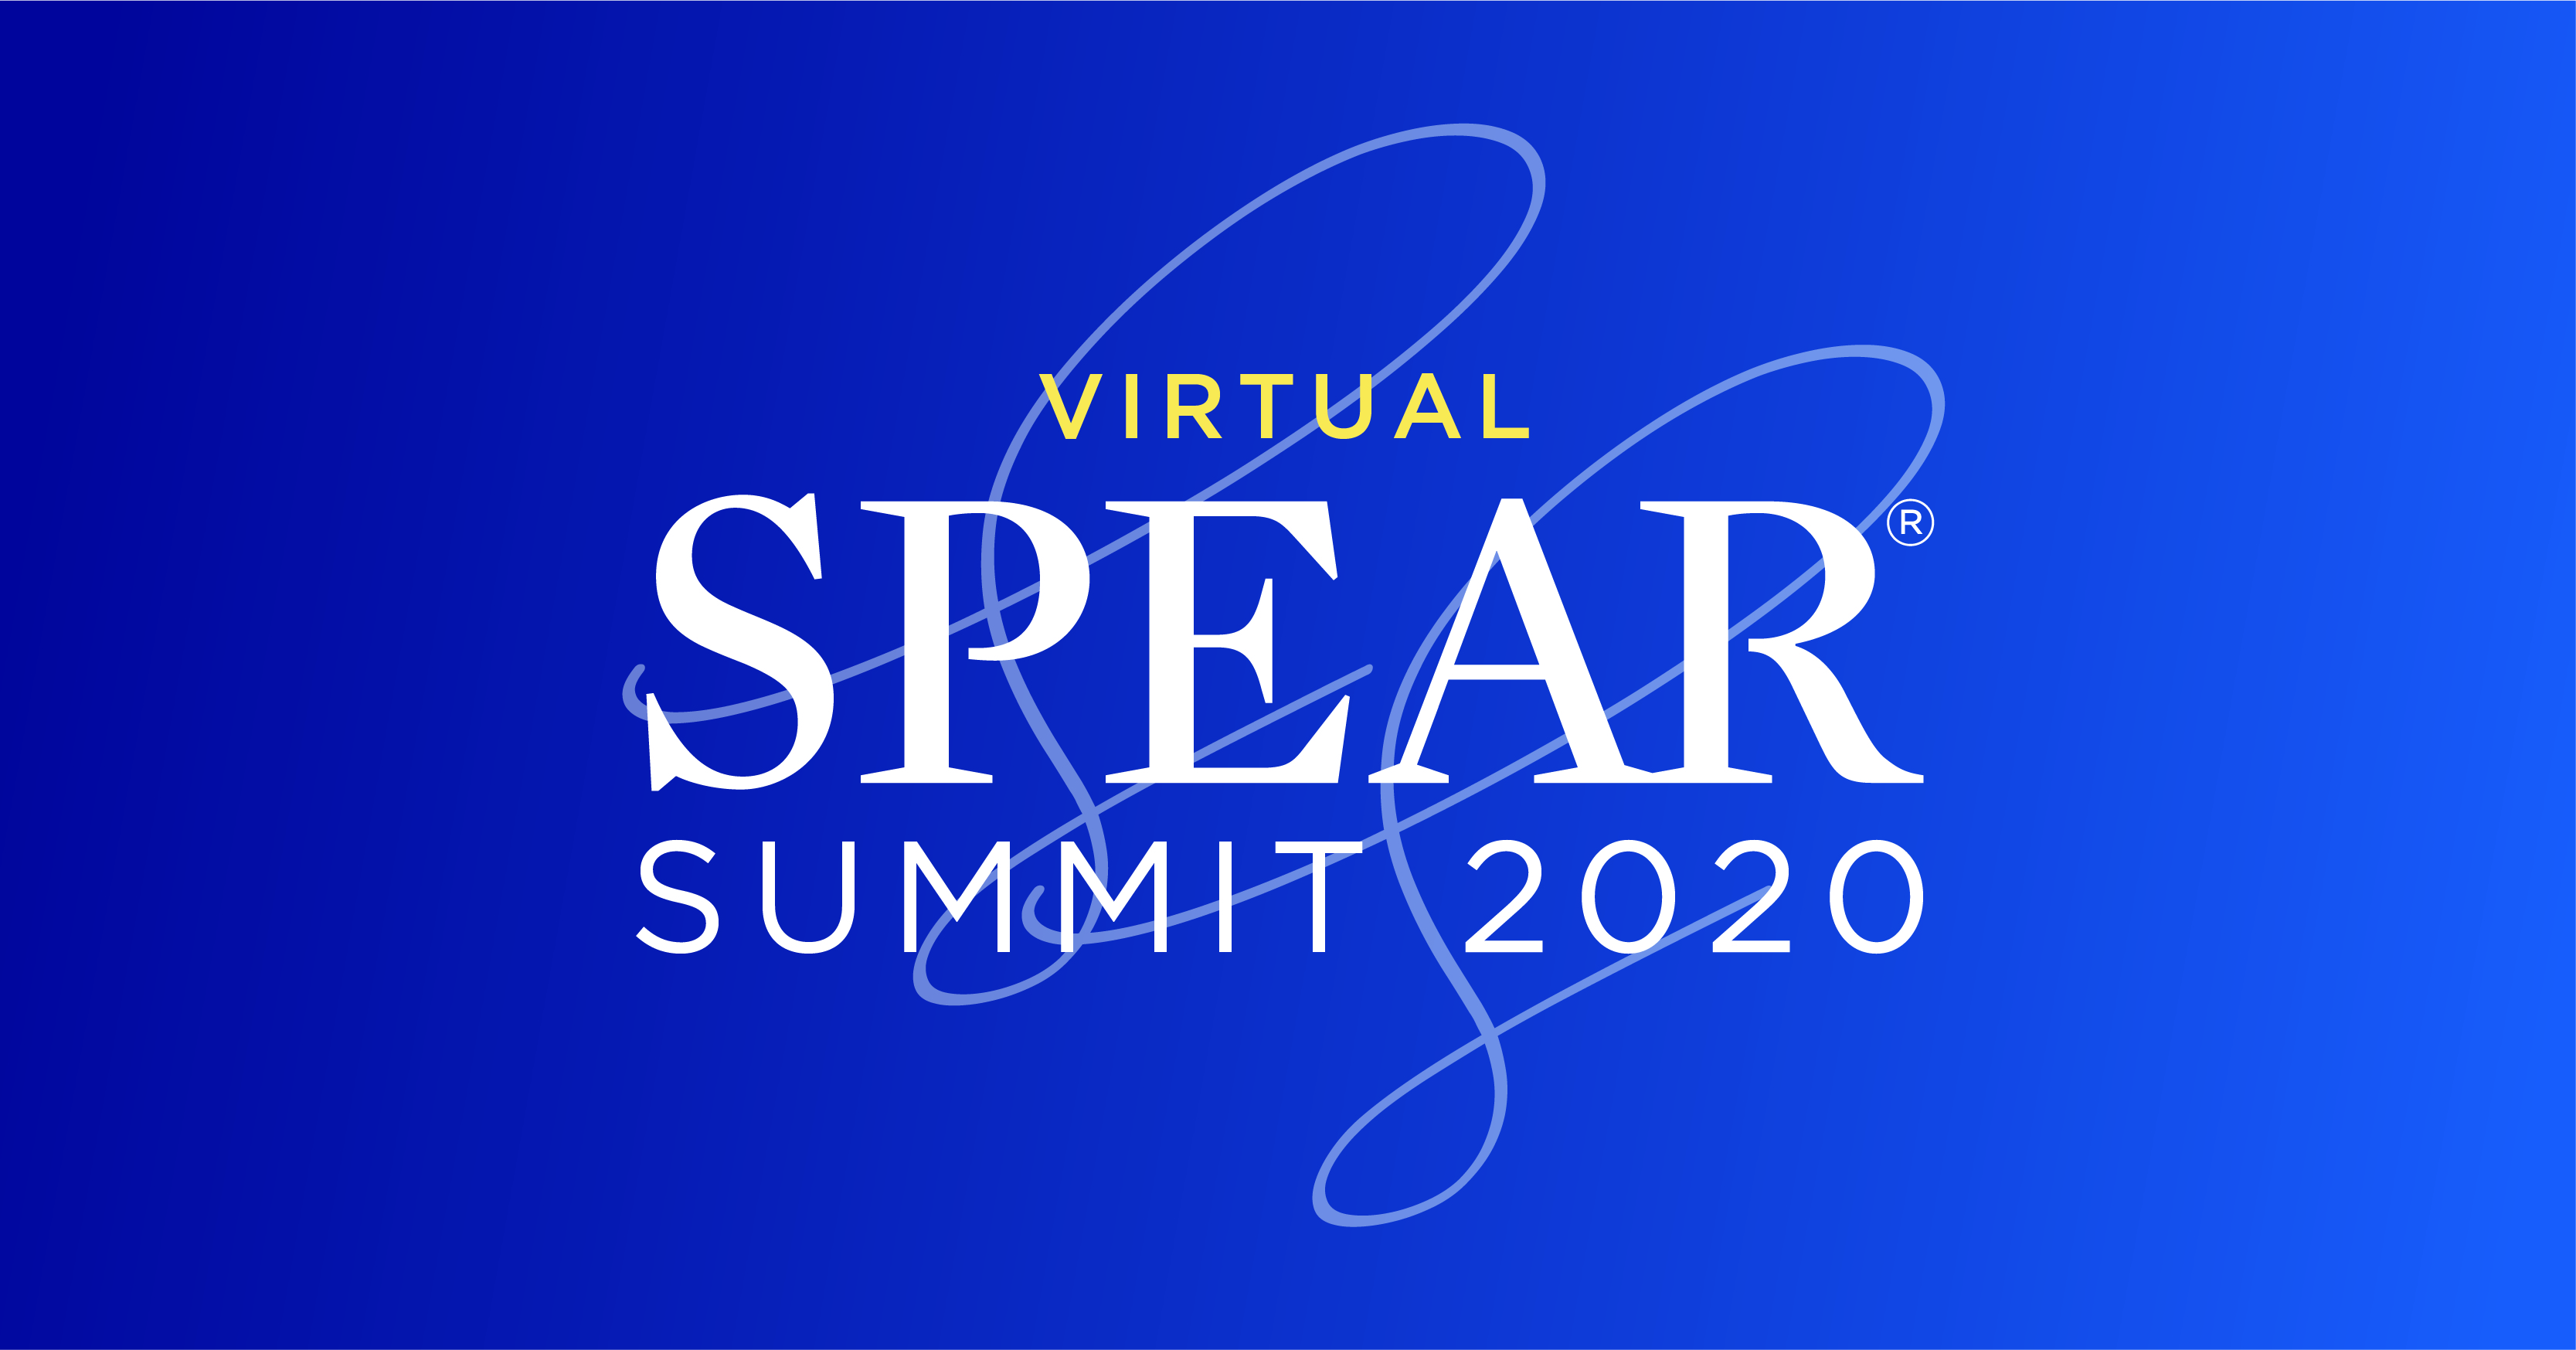 Virtual Spear Summit 2020